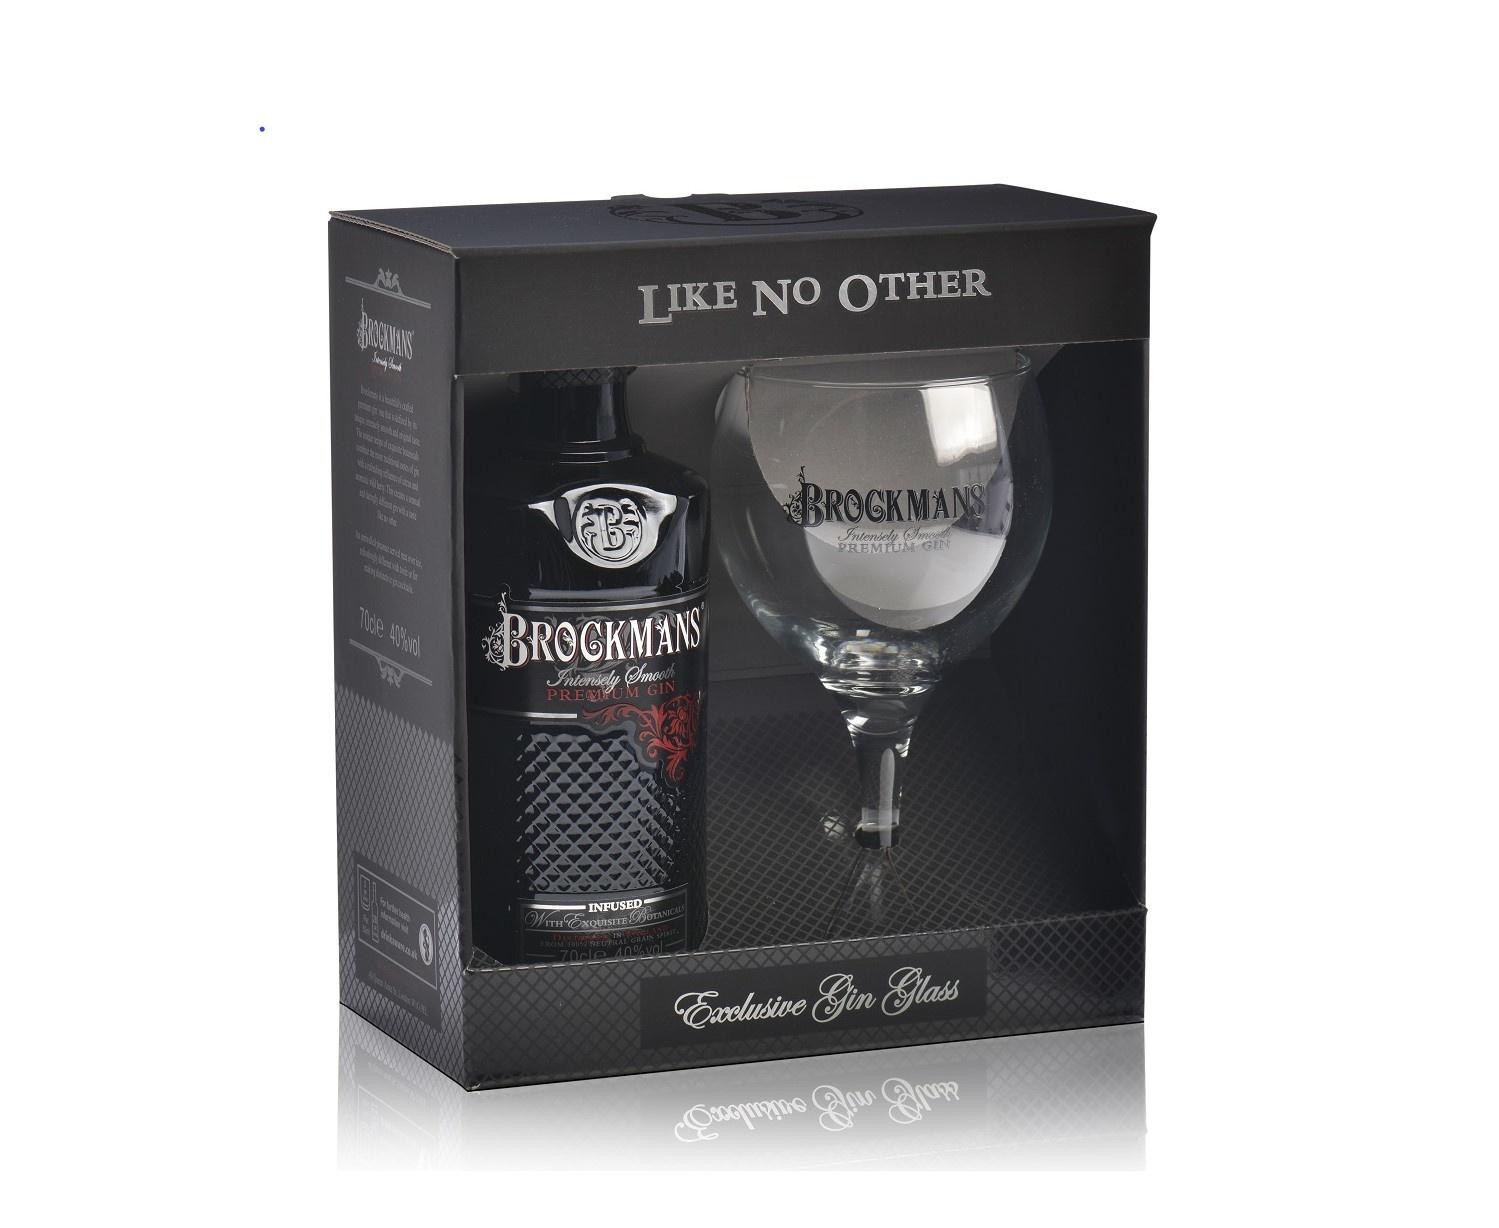 Brockmans Brockmans Premium Gin Giftpack 70CL